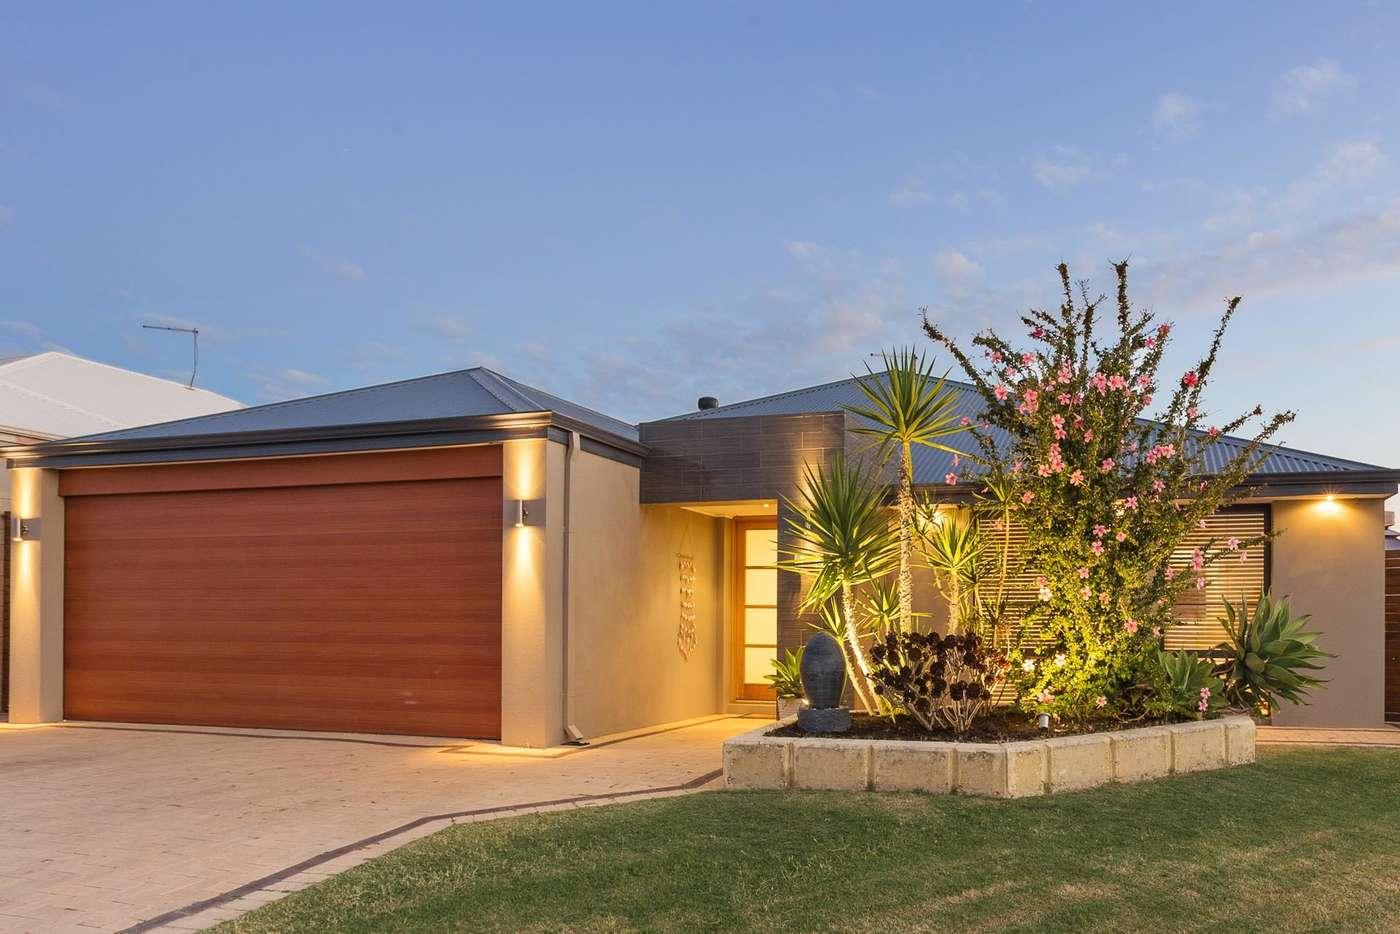 Main view of Homely house listing, 22 Gordona Parade, Beeliar WA 6164